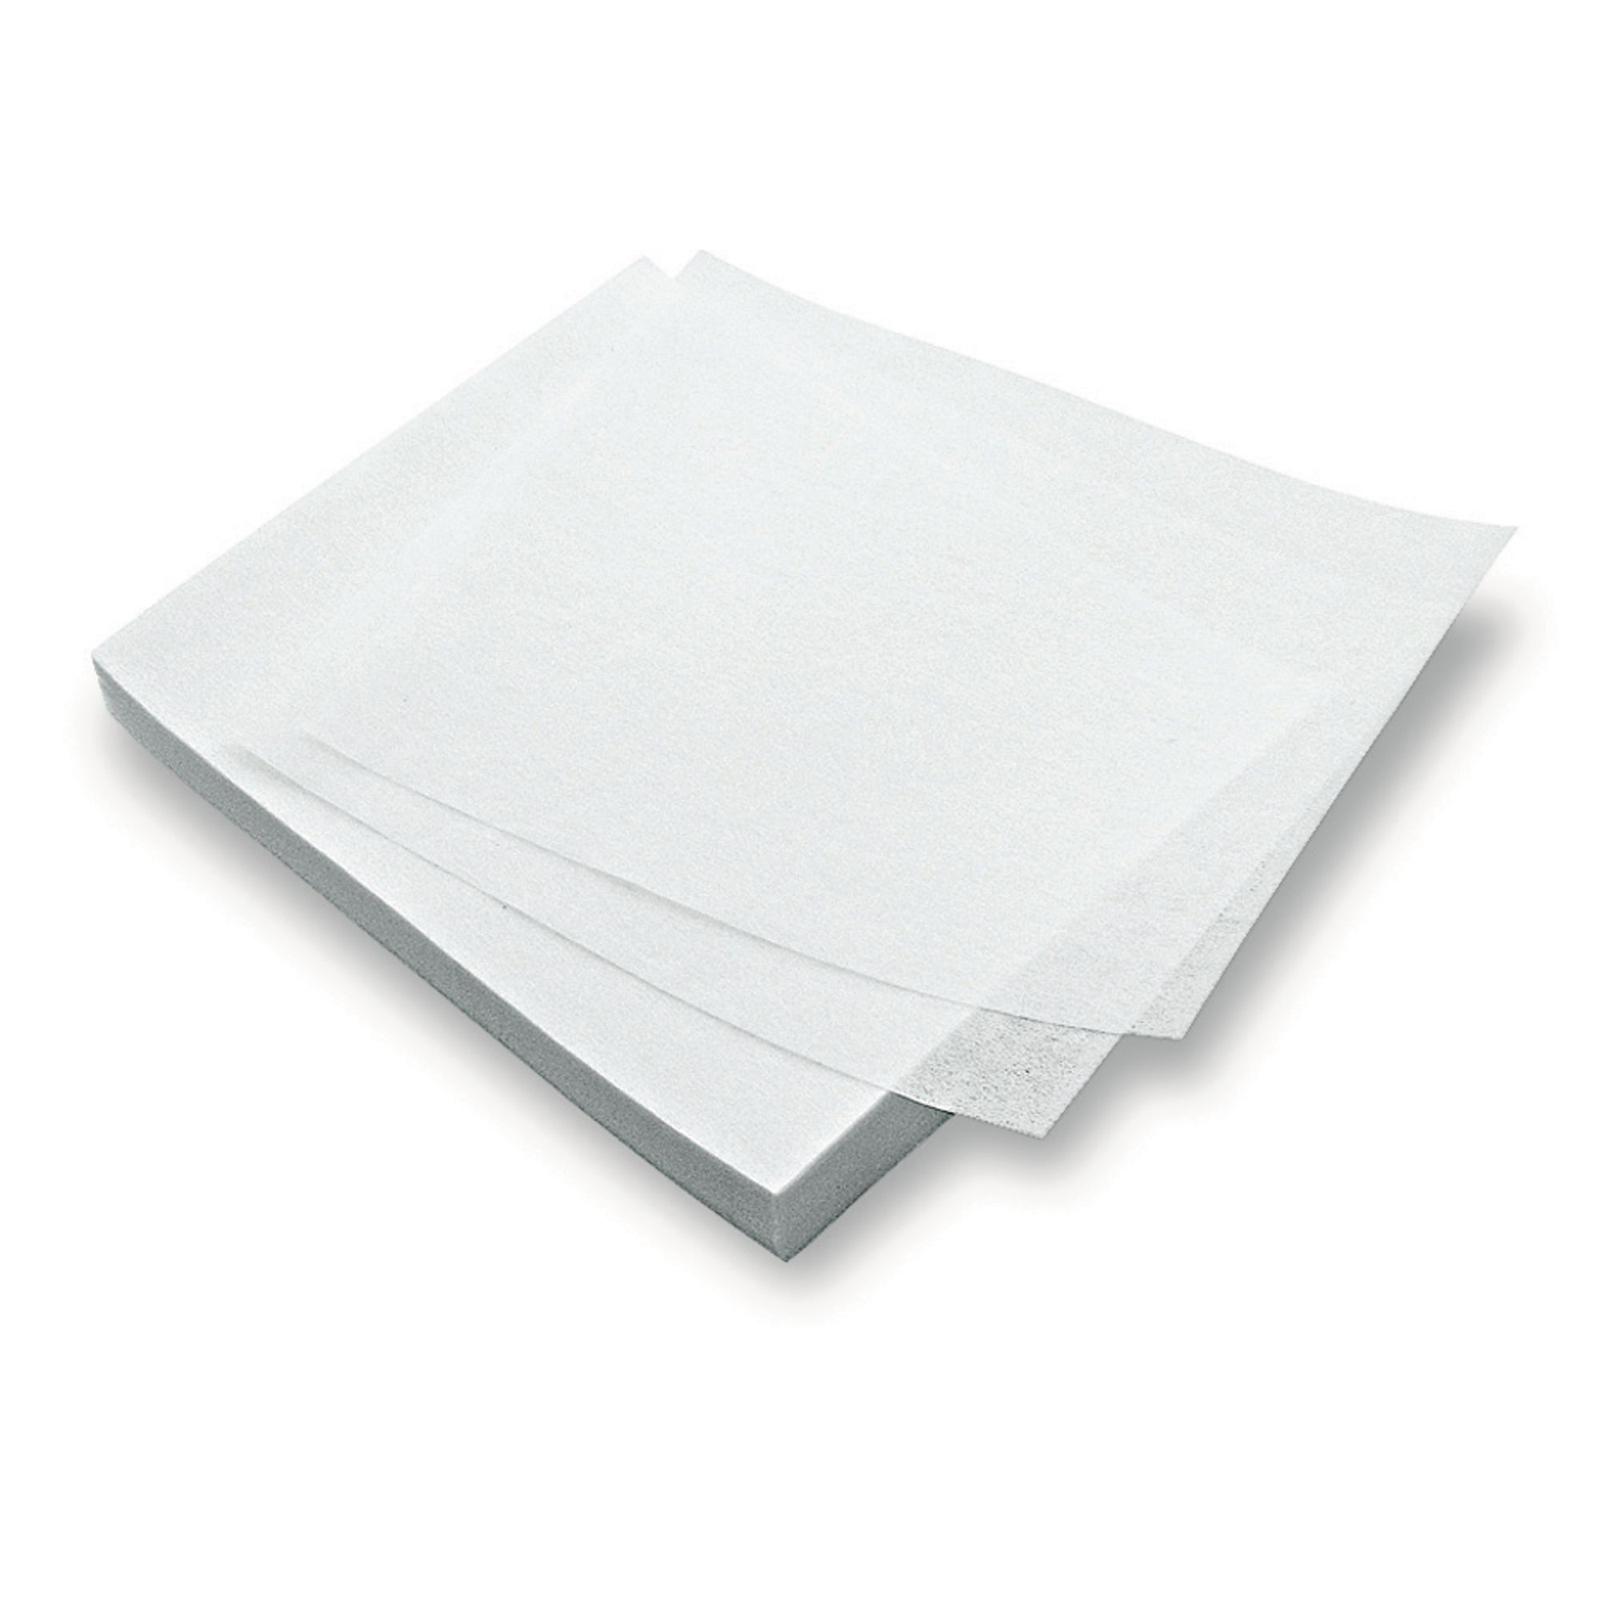 Edding BMA2 Board Eraser Refill Sheets- Pack of 100